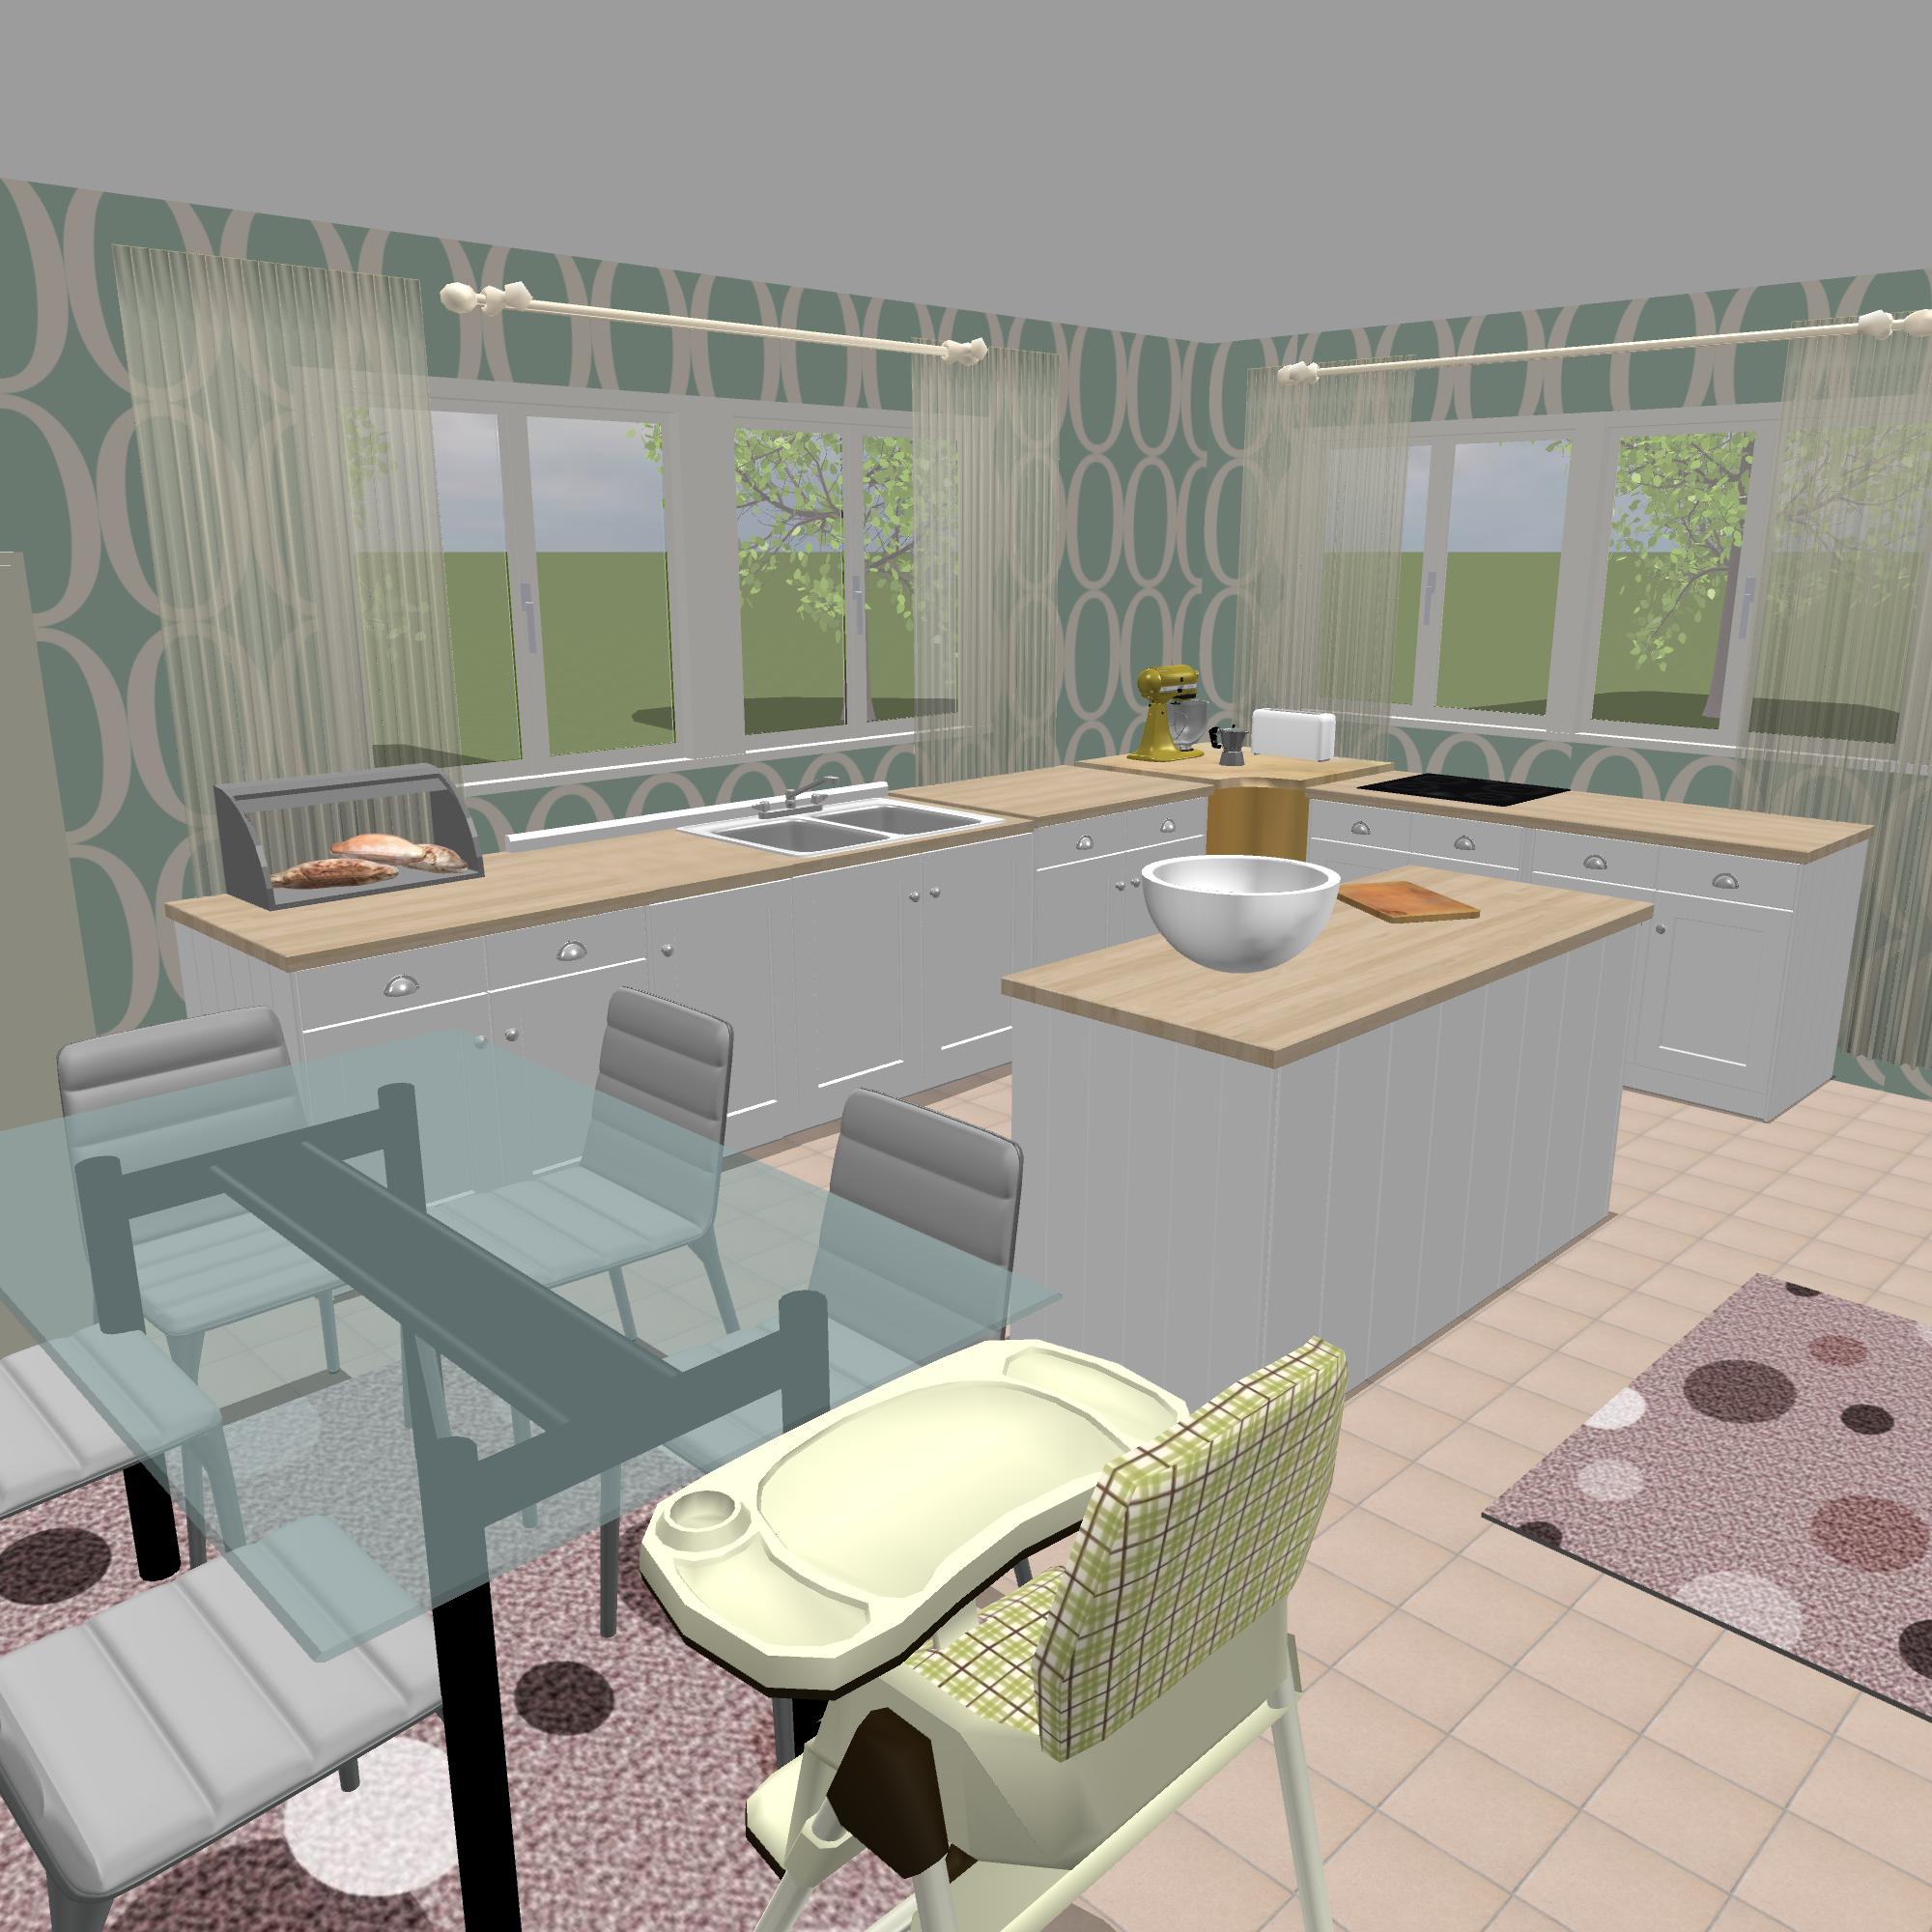 130sqm_kitchen.png